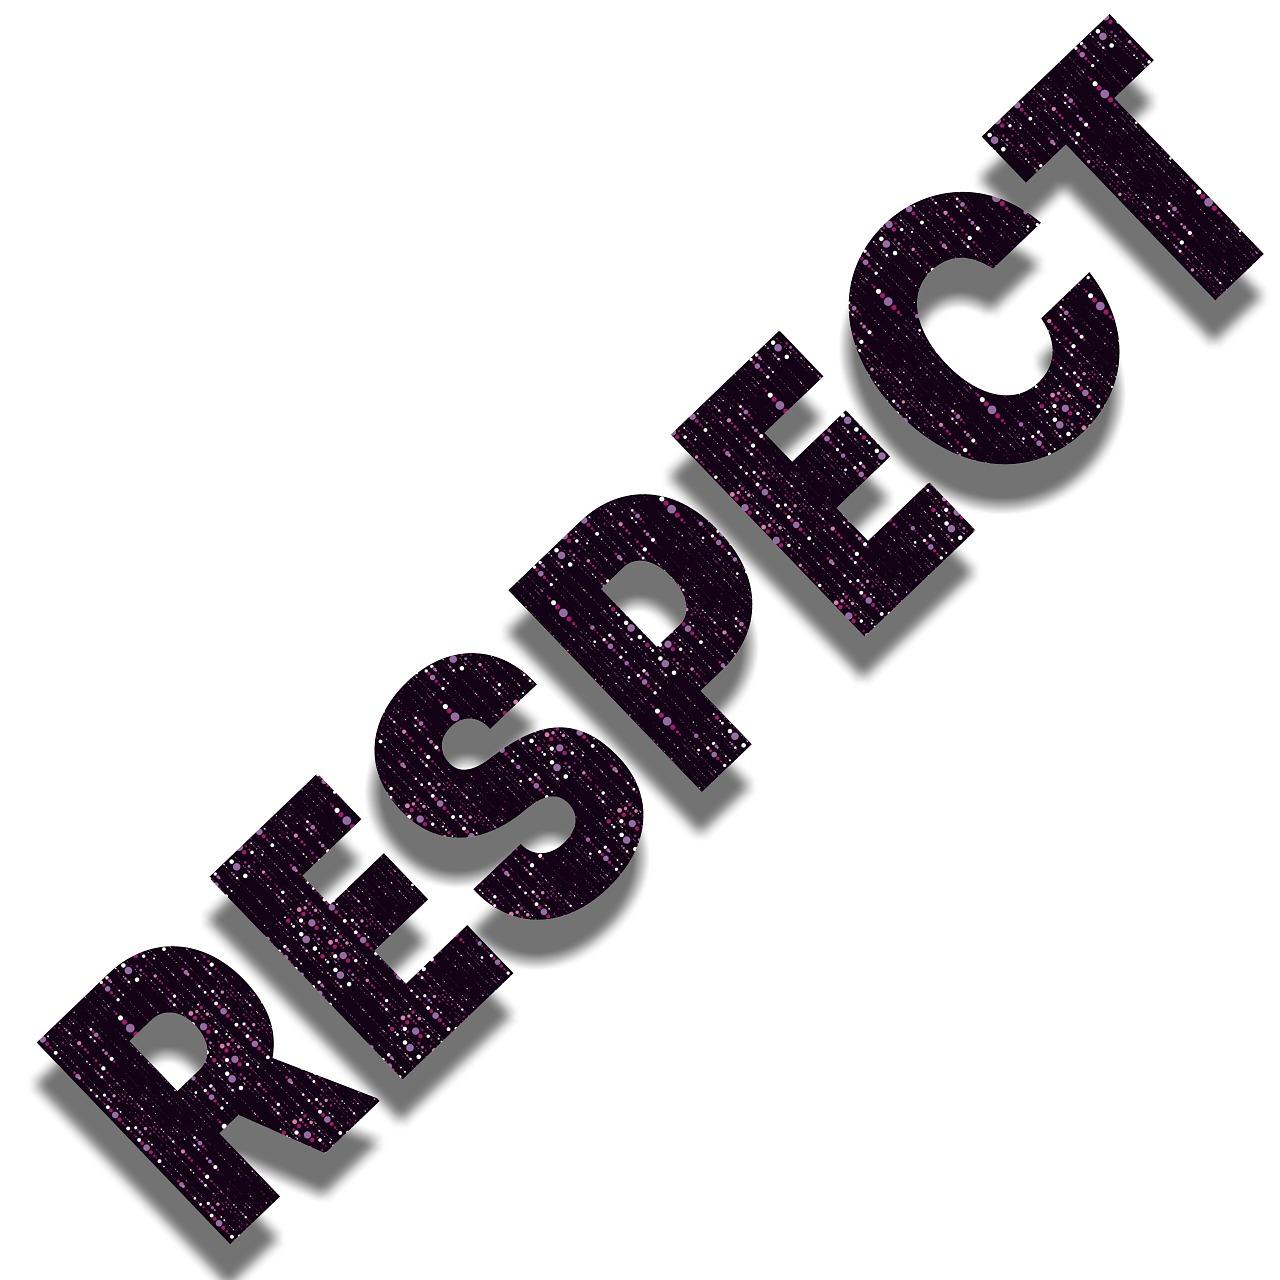 relacion respeto